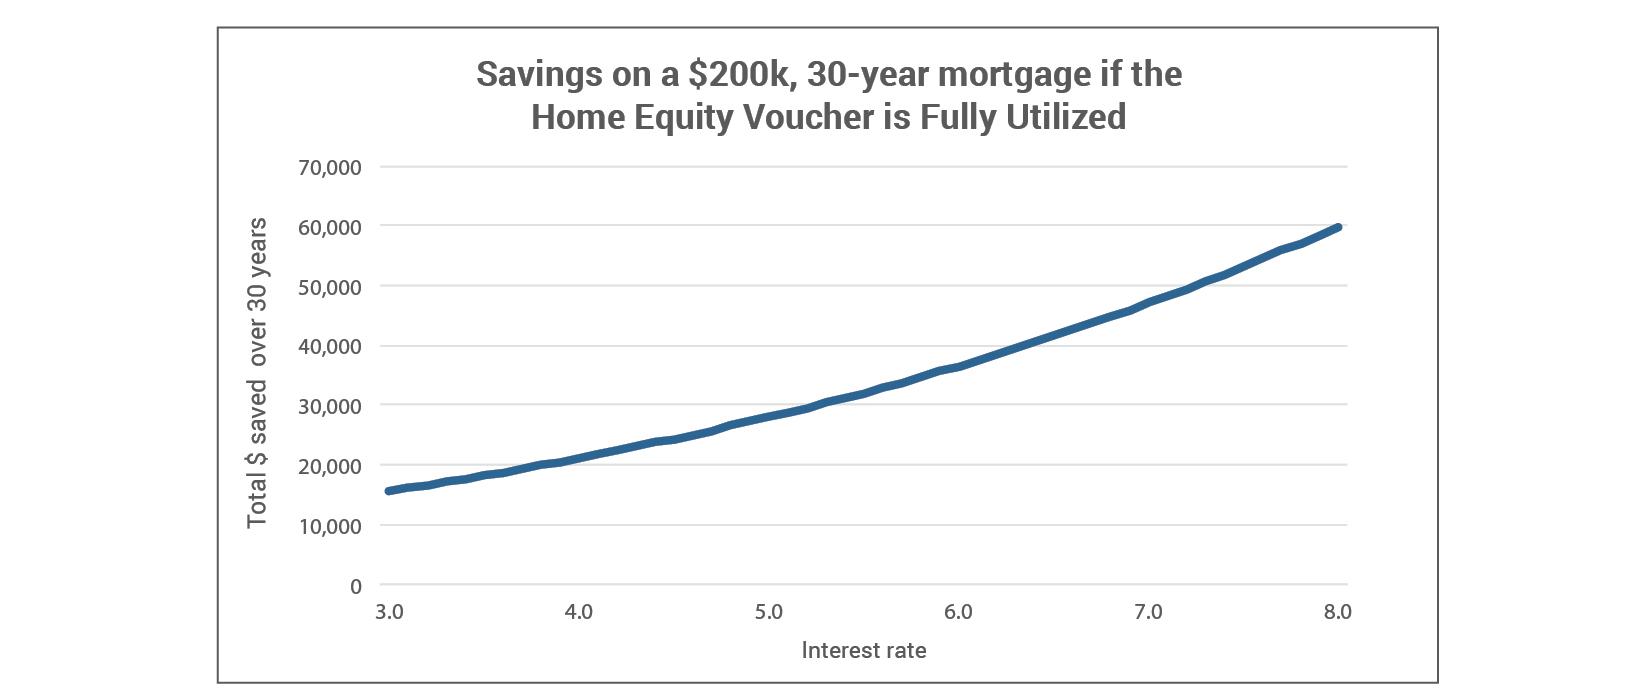 Savings on a $200k, 30-year mortgage